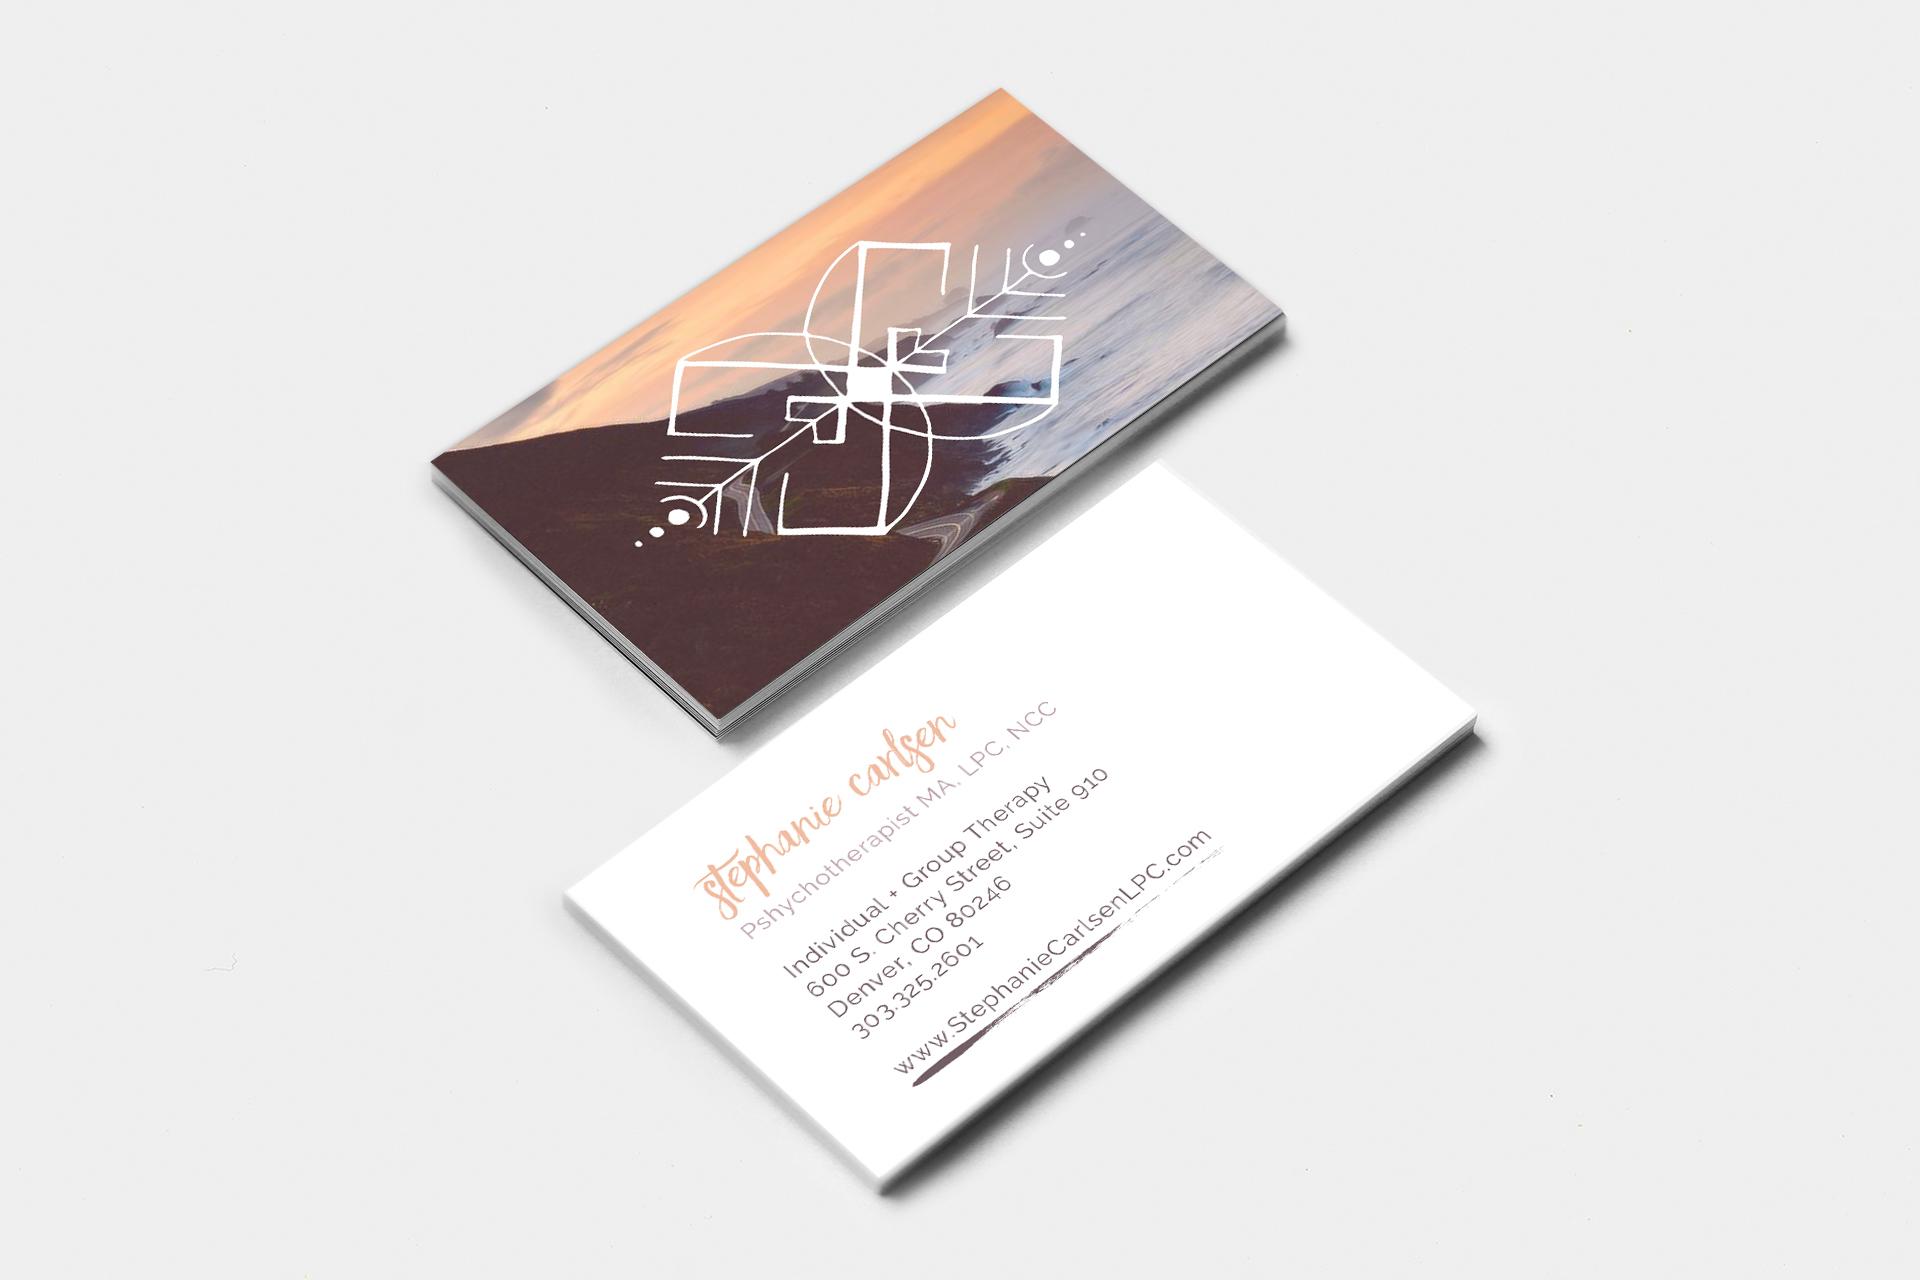 steph business card mockup.jpg